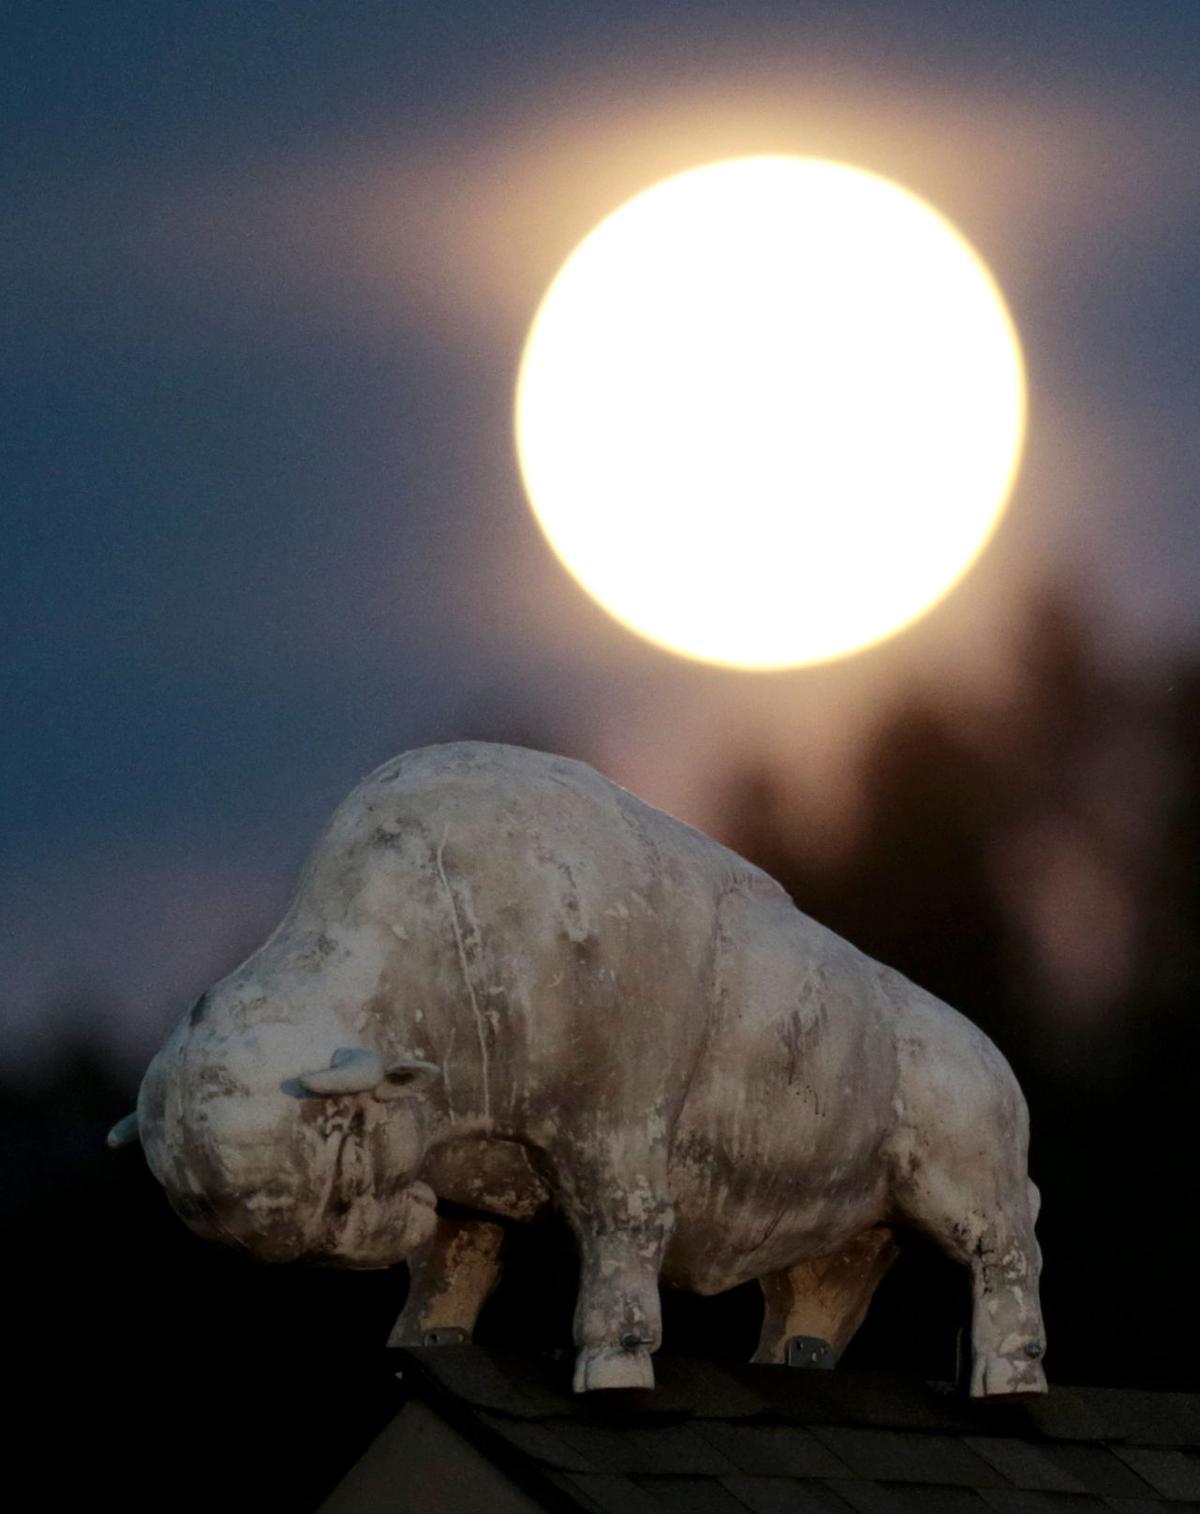 Pictures: Supermoon seen around the world - Orlando Sentinel